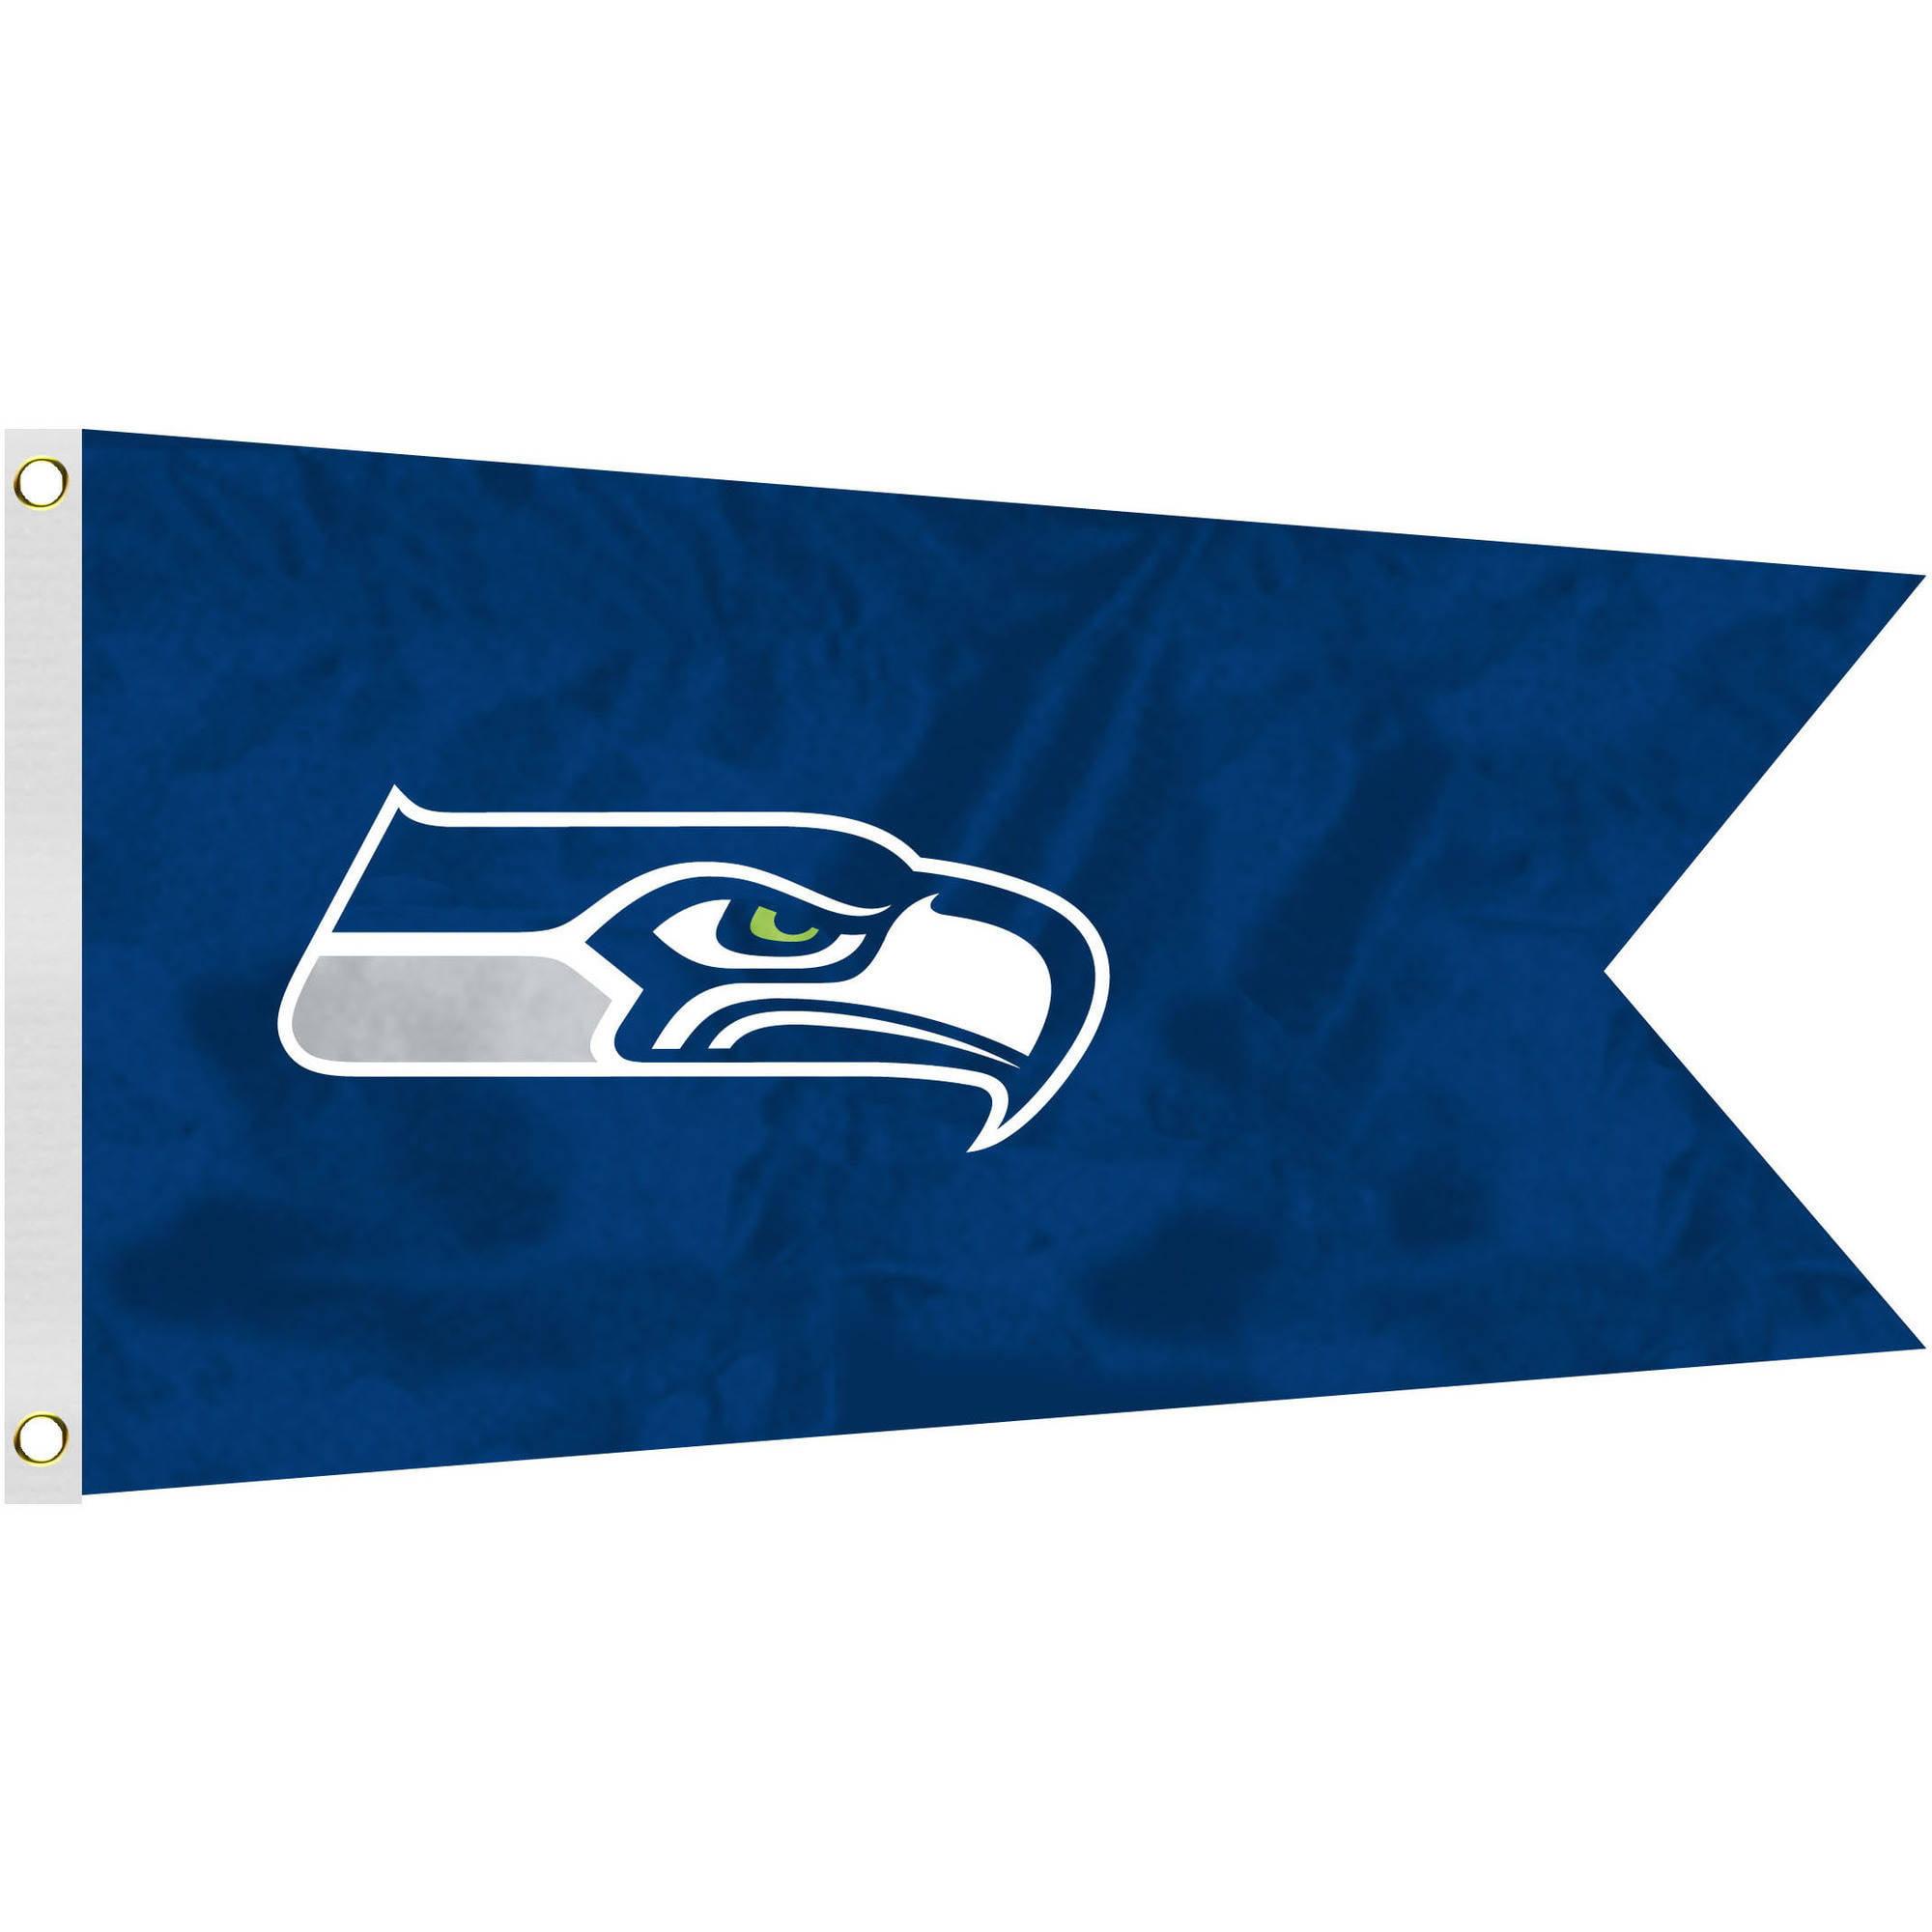 NFL Seattle Seahawks Boat Flag